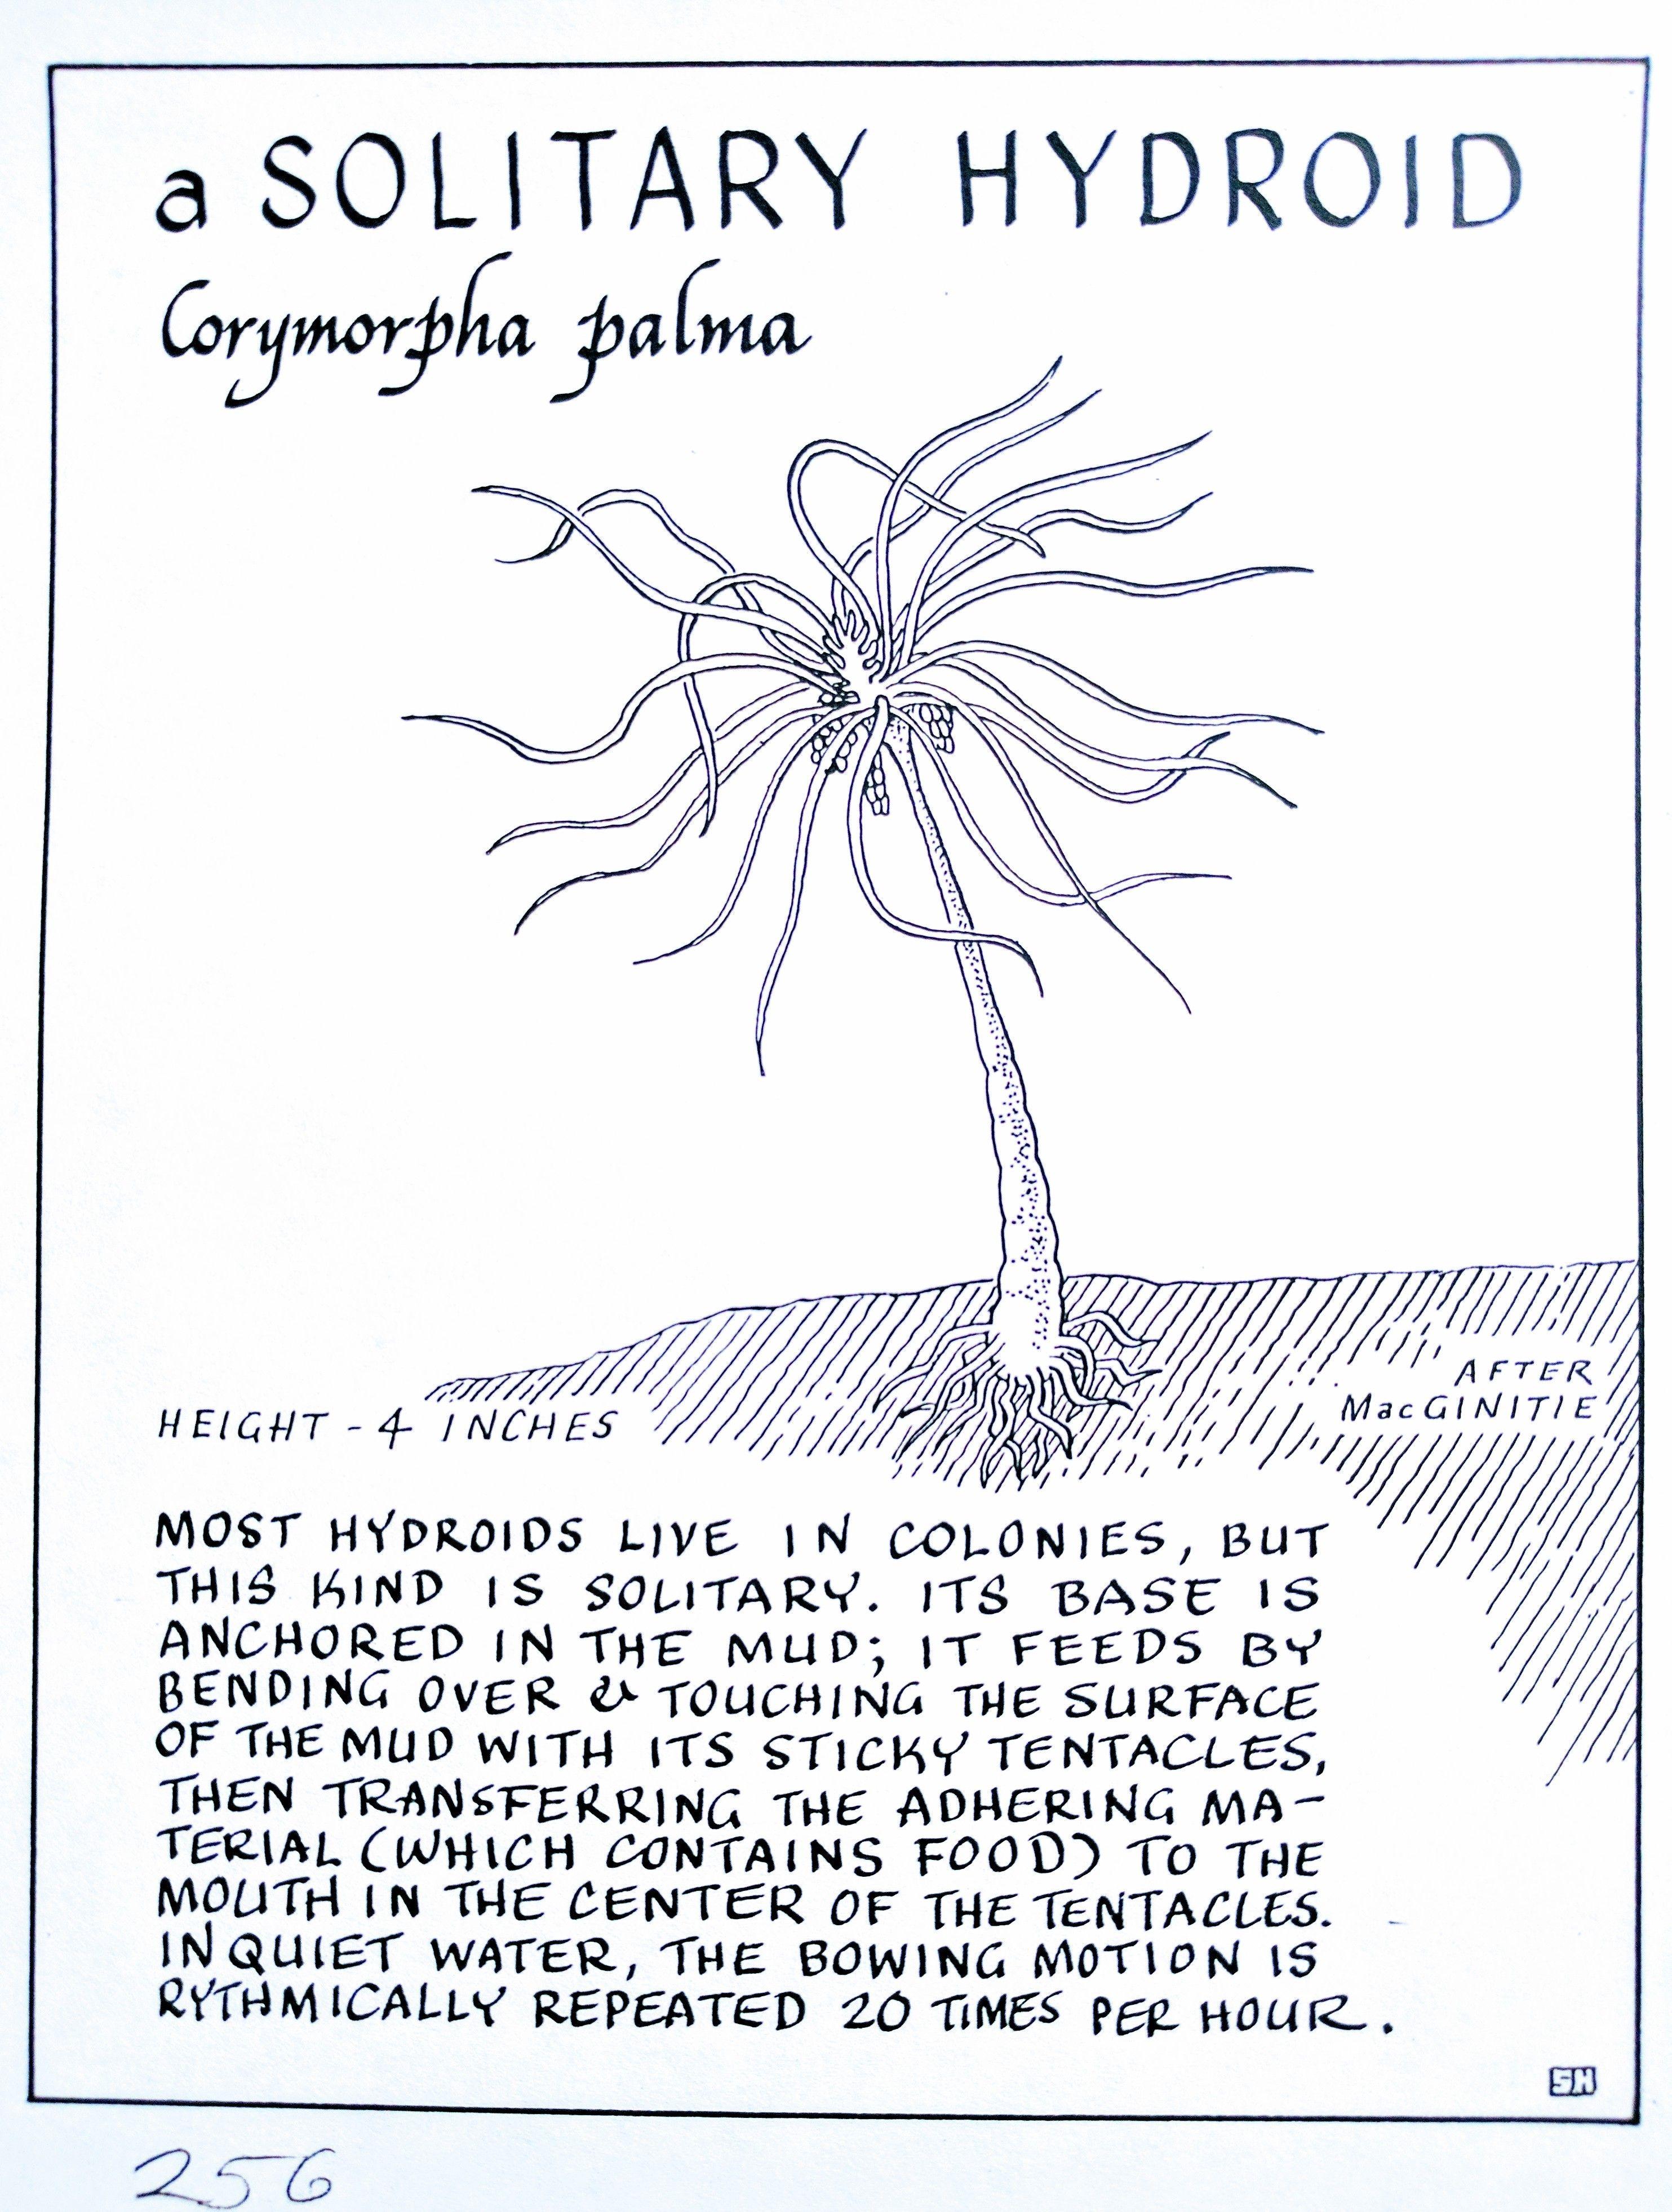 A Solitary Hydroid Corymorpha Palma